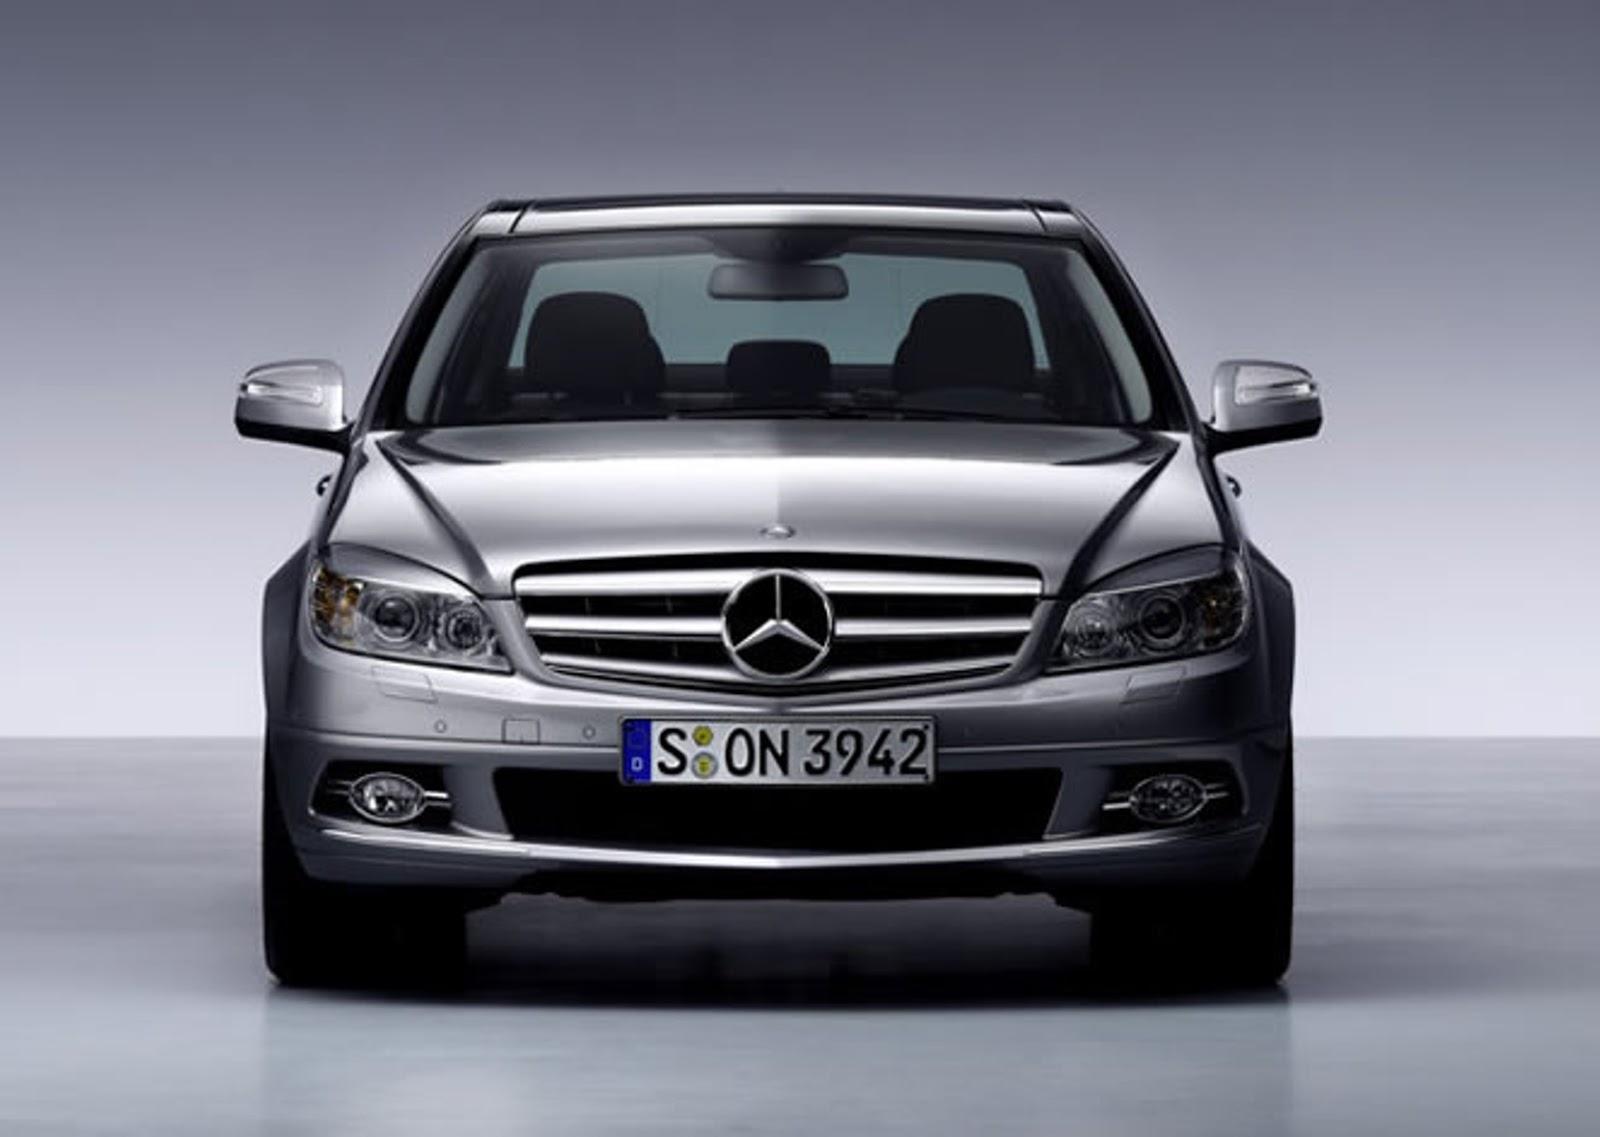 Mercedes Benz C250 Cgi Avantgarde